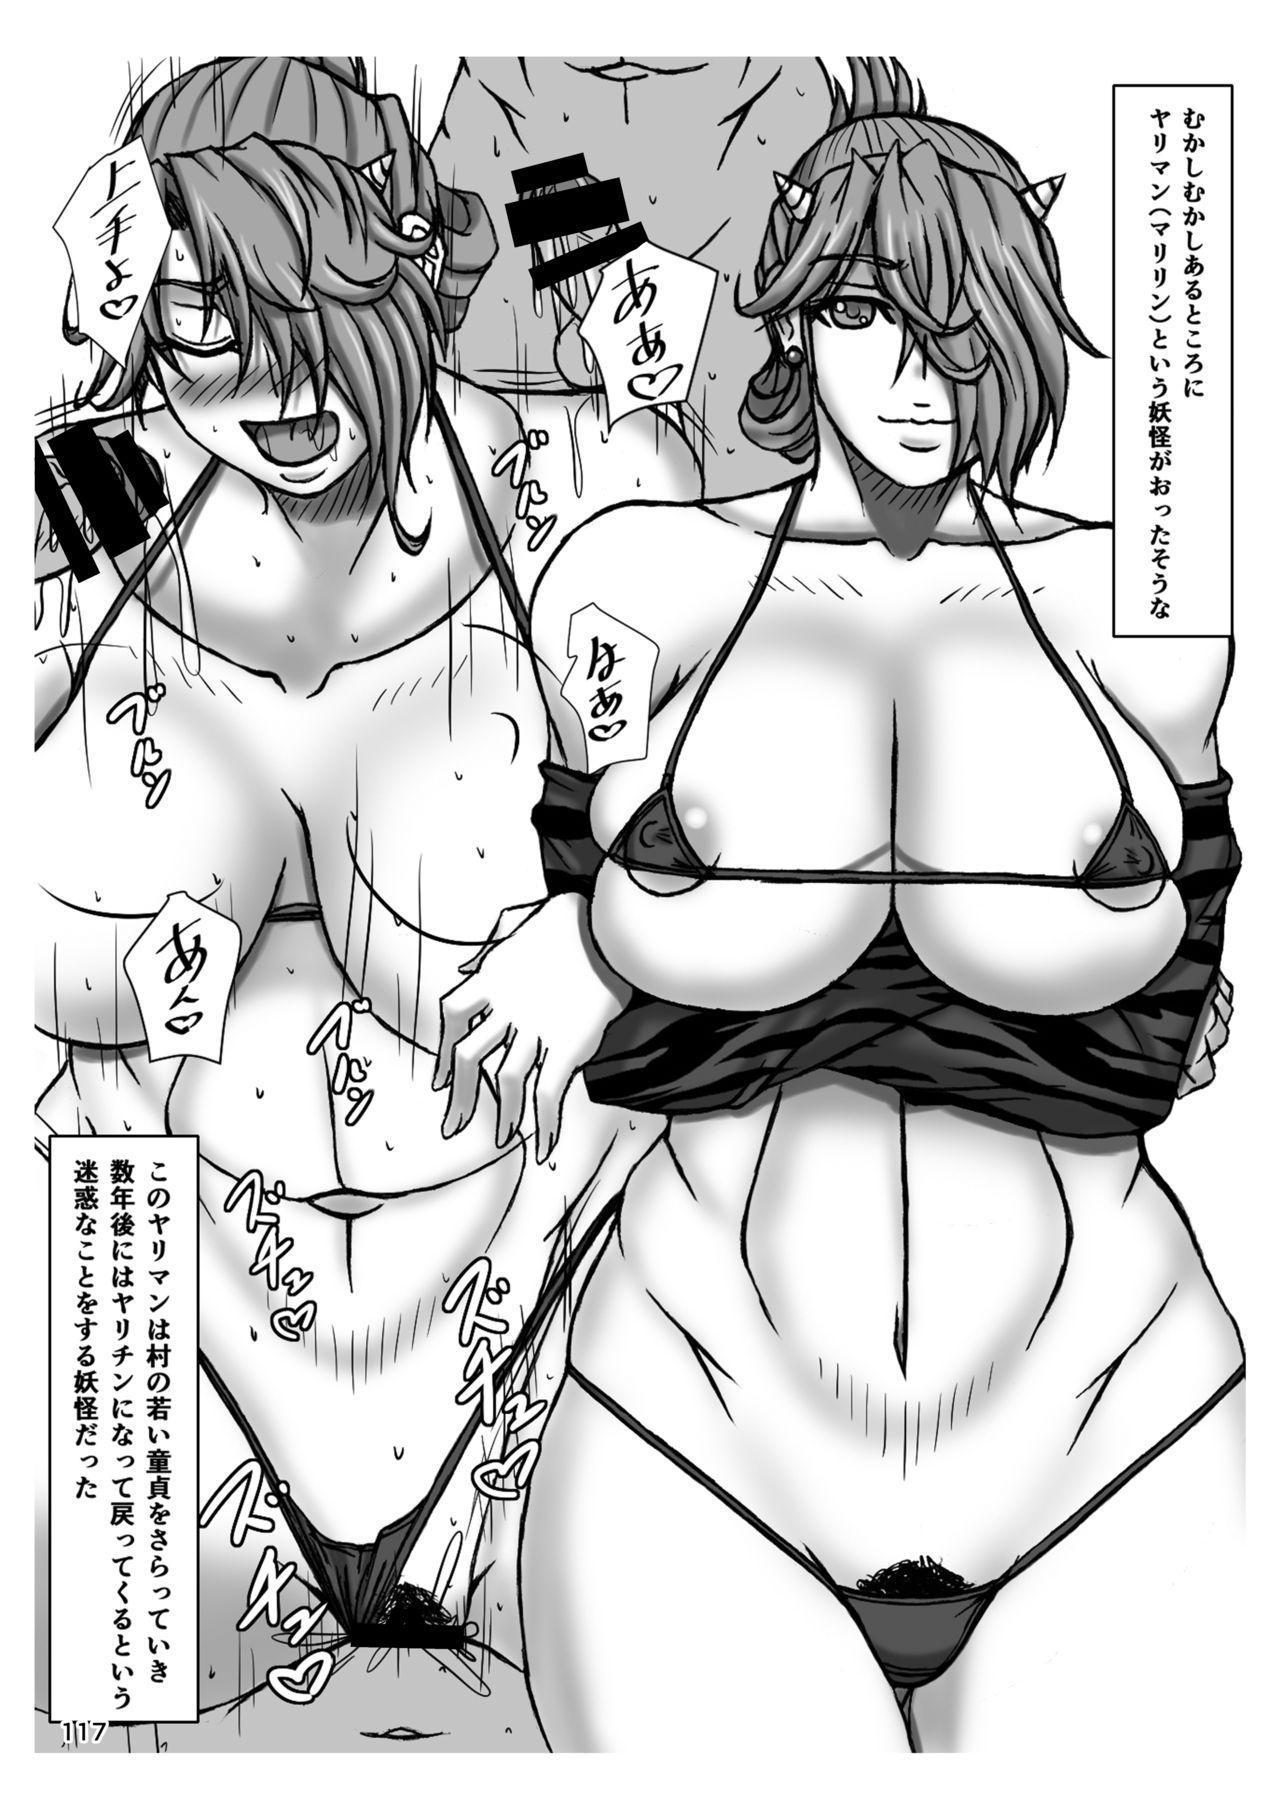 Akatsuki Blitzkampf & EN-1 Perfekt Welt Gangbang Anthology 116